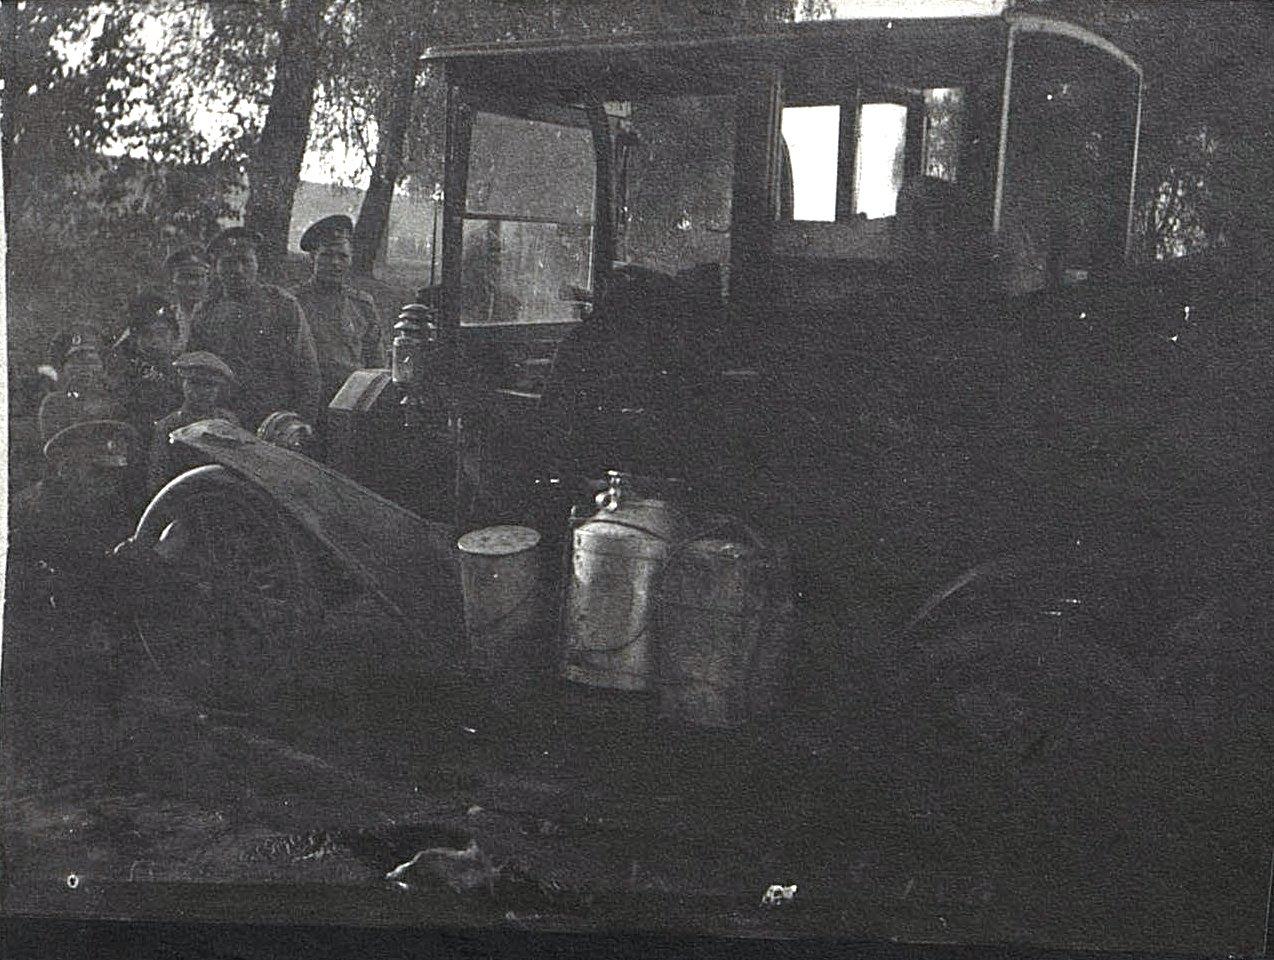 20. Катастрофа с автомобилем. 1915